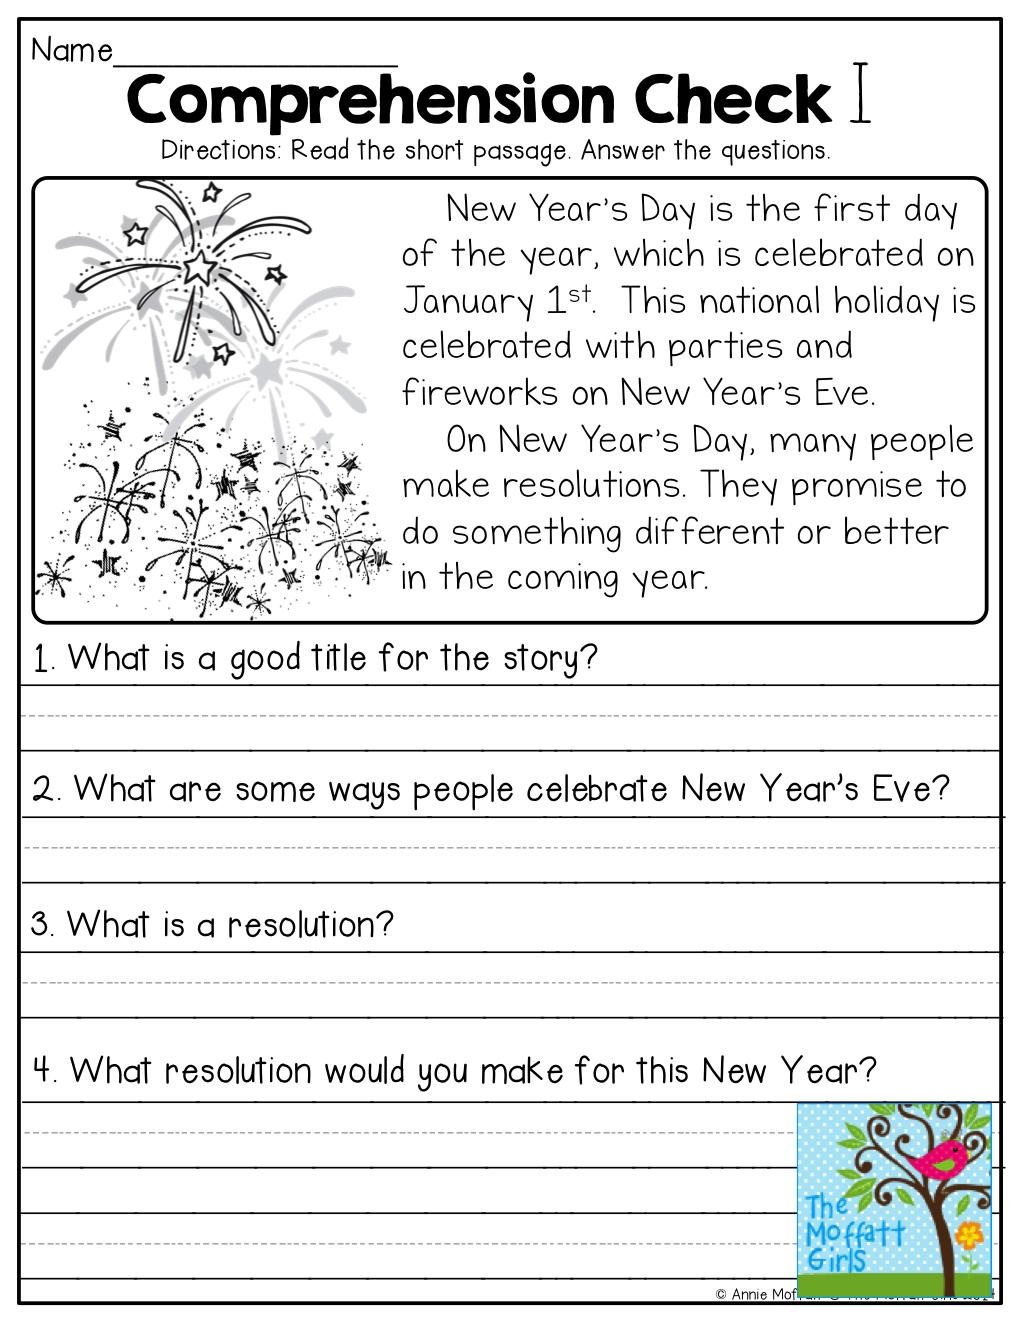 Free 1st Grade Reading Comprehension Worksheets Pictures